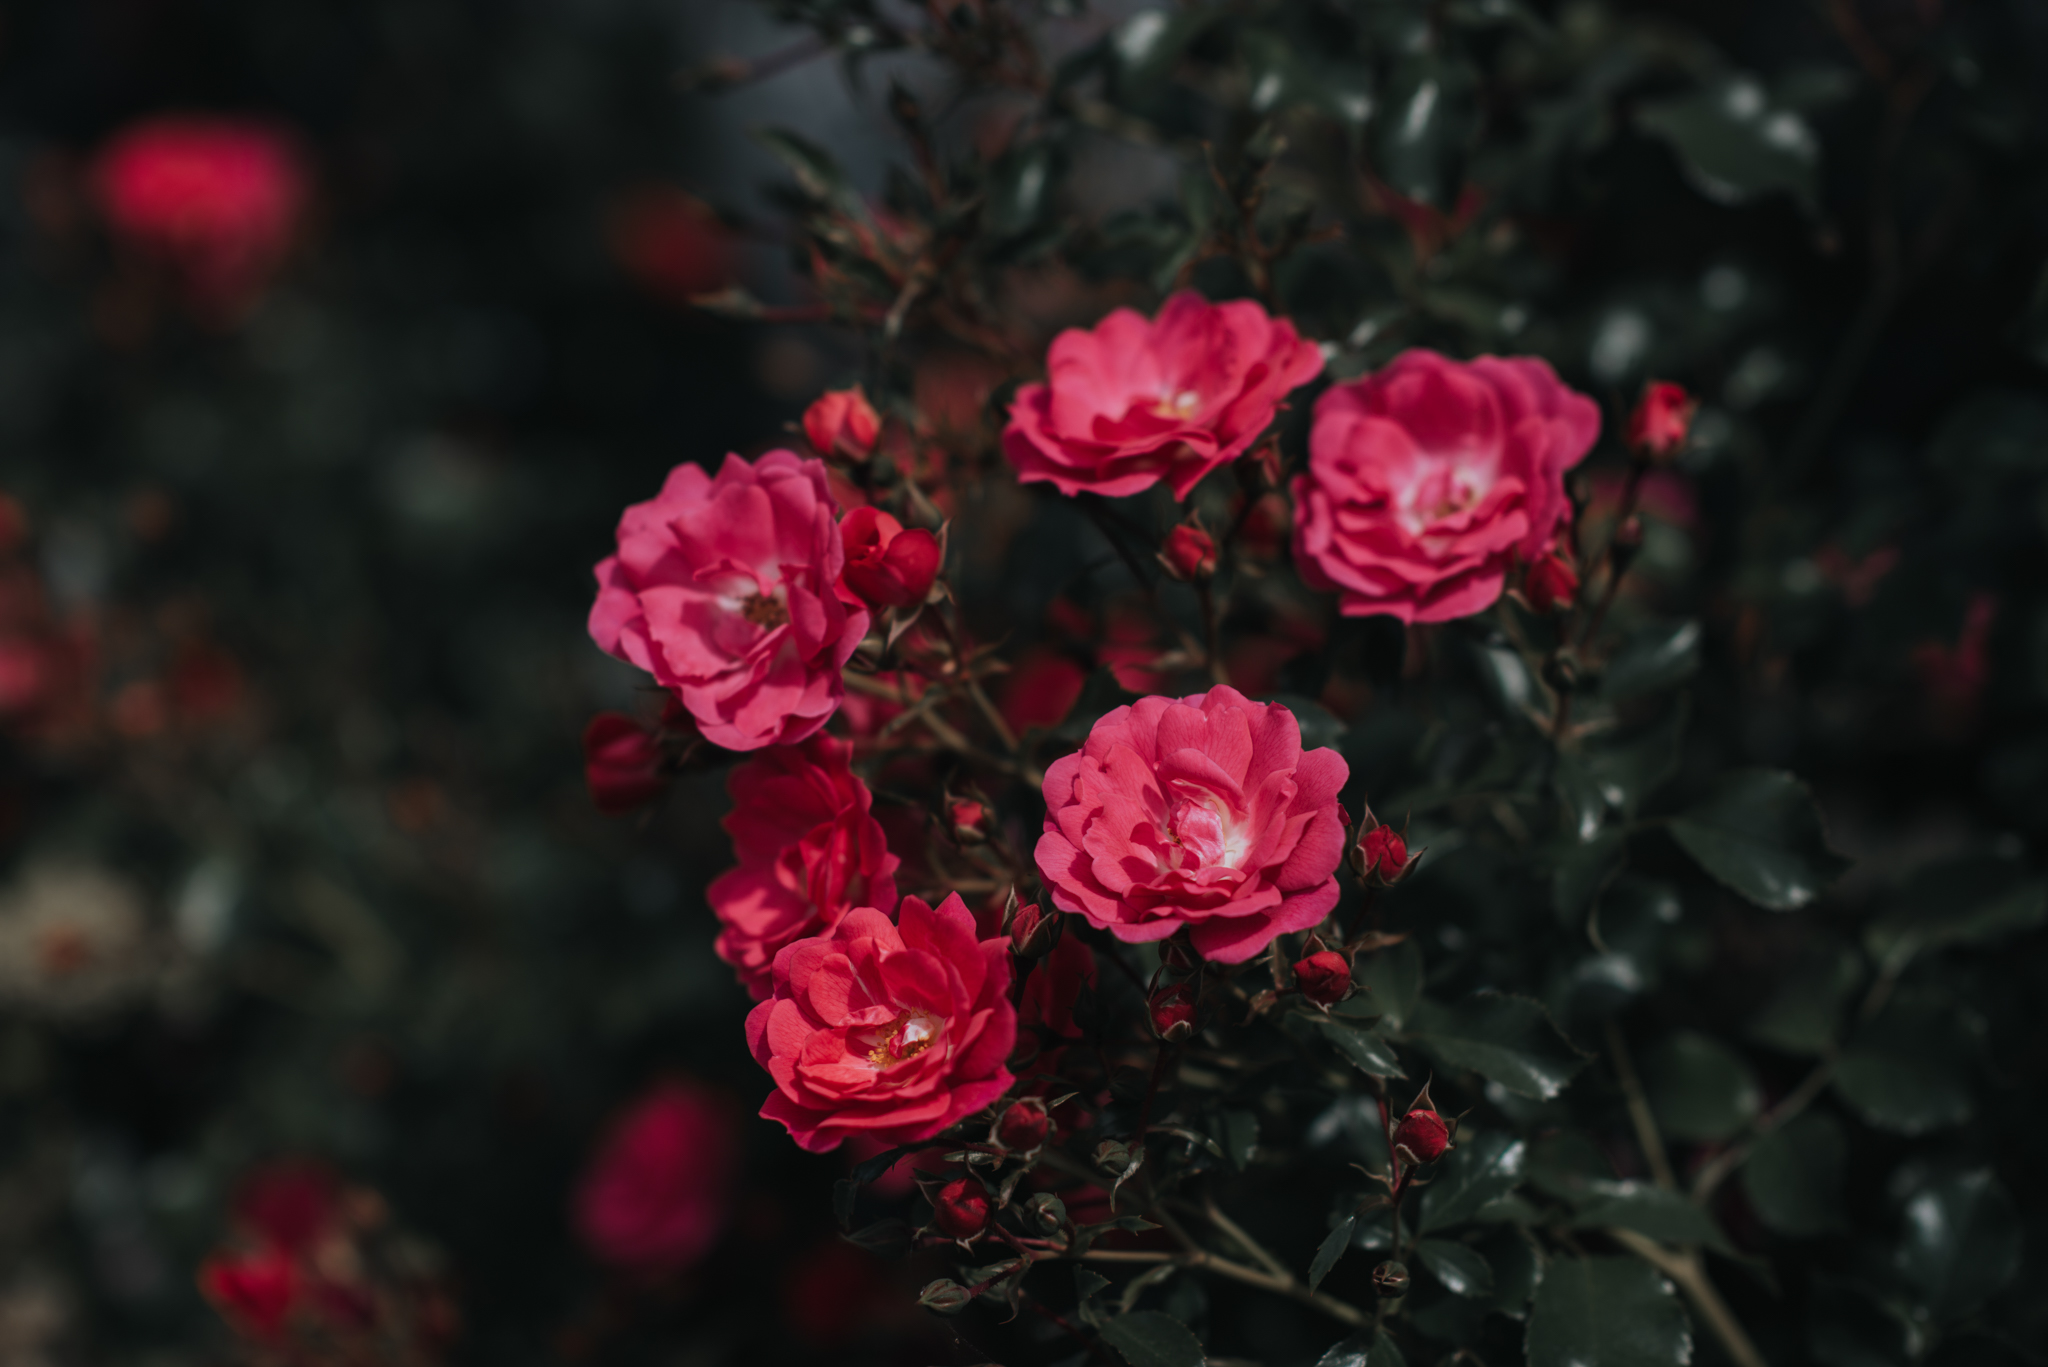 LOVELENSCAPES PHOTOGRAPHY • VISUAL POETRY • NEW ZEALAND WEDDING PHOTOGRAPHER • AUSTRALIAN WEDDING PHOTOGRAPHER • BRISBANE • MELBOURNE • SYDNEY • HOBART • TARUREKA ESTATE • ANNA CAMPBELL • 8.jpg